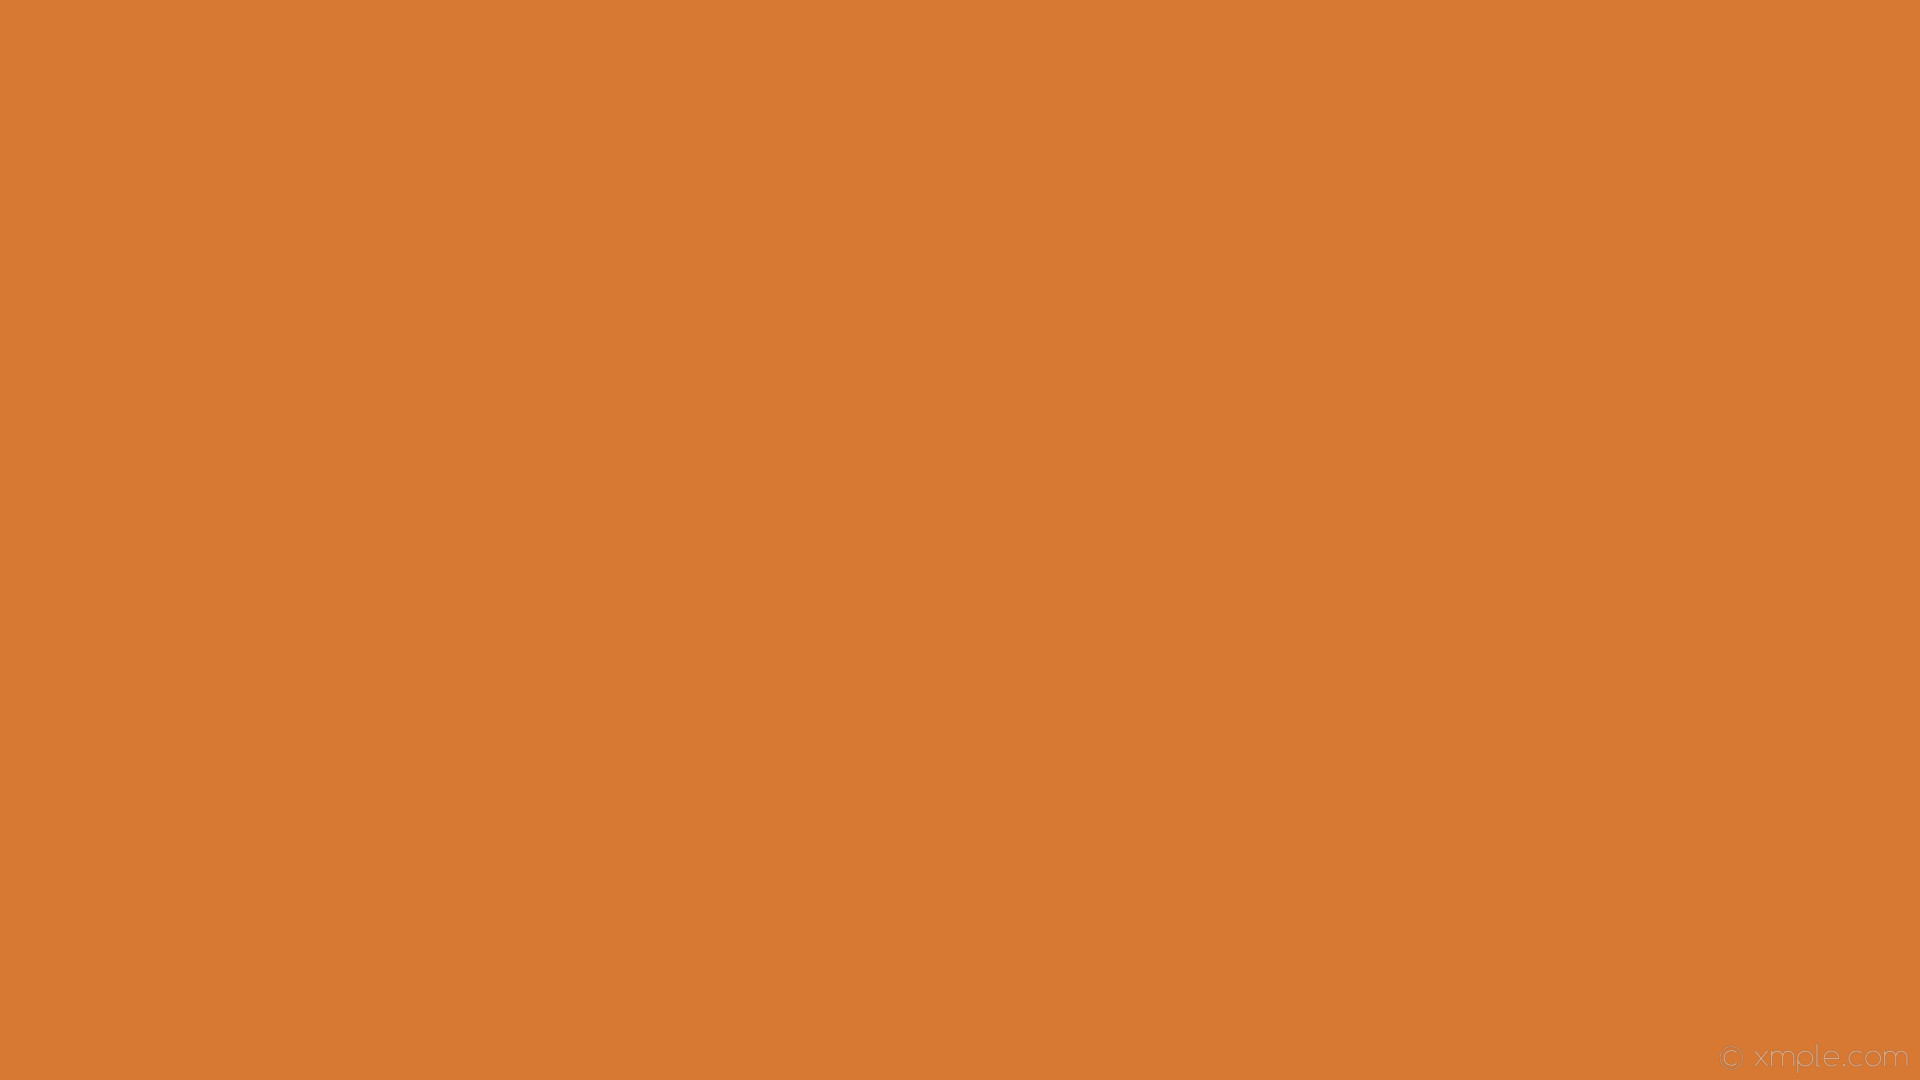 Dark orange color background wallpaper - Dark orange wallpaper ...